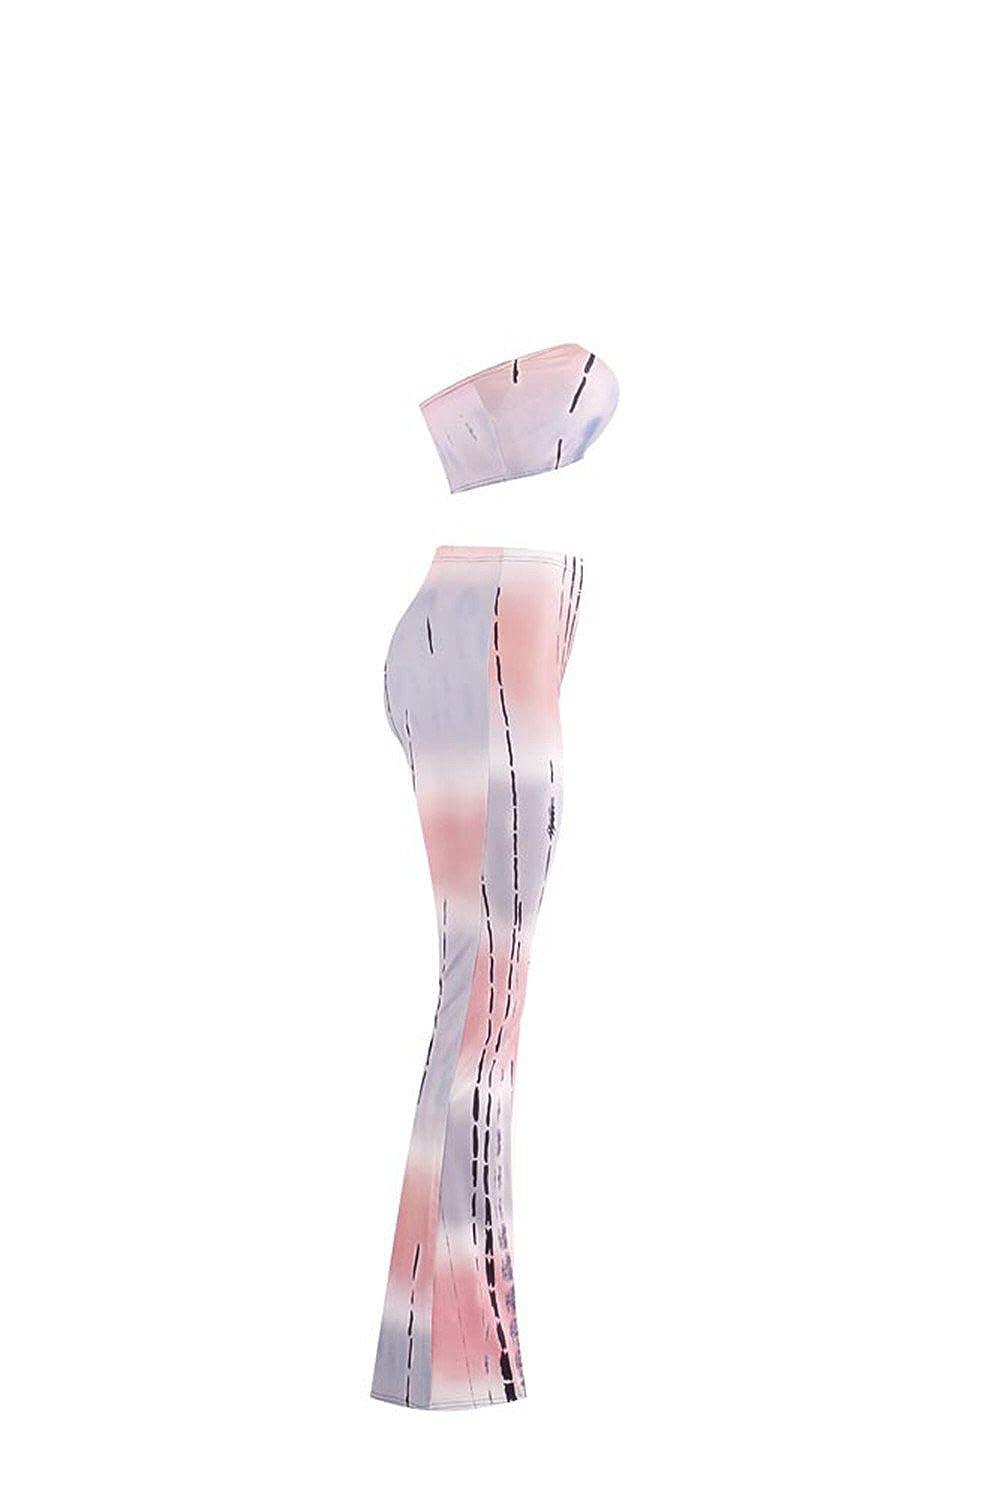 MostaShow Tie-dye Printed Bandage Female Pants Gradient Bell-Bottom Wide Leg Pants Evening Party Bandage Pants Trousers